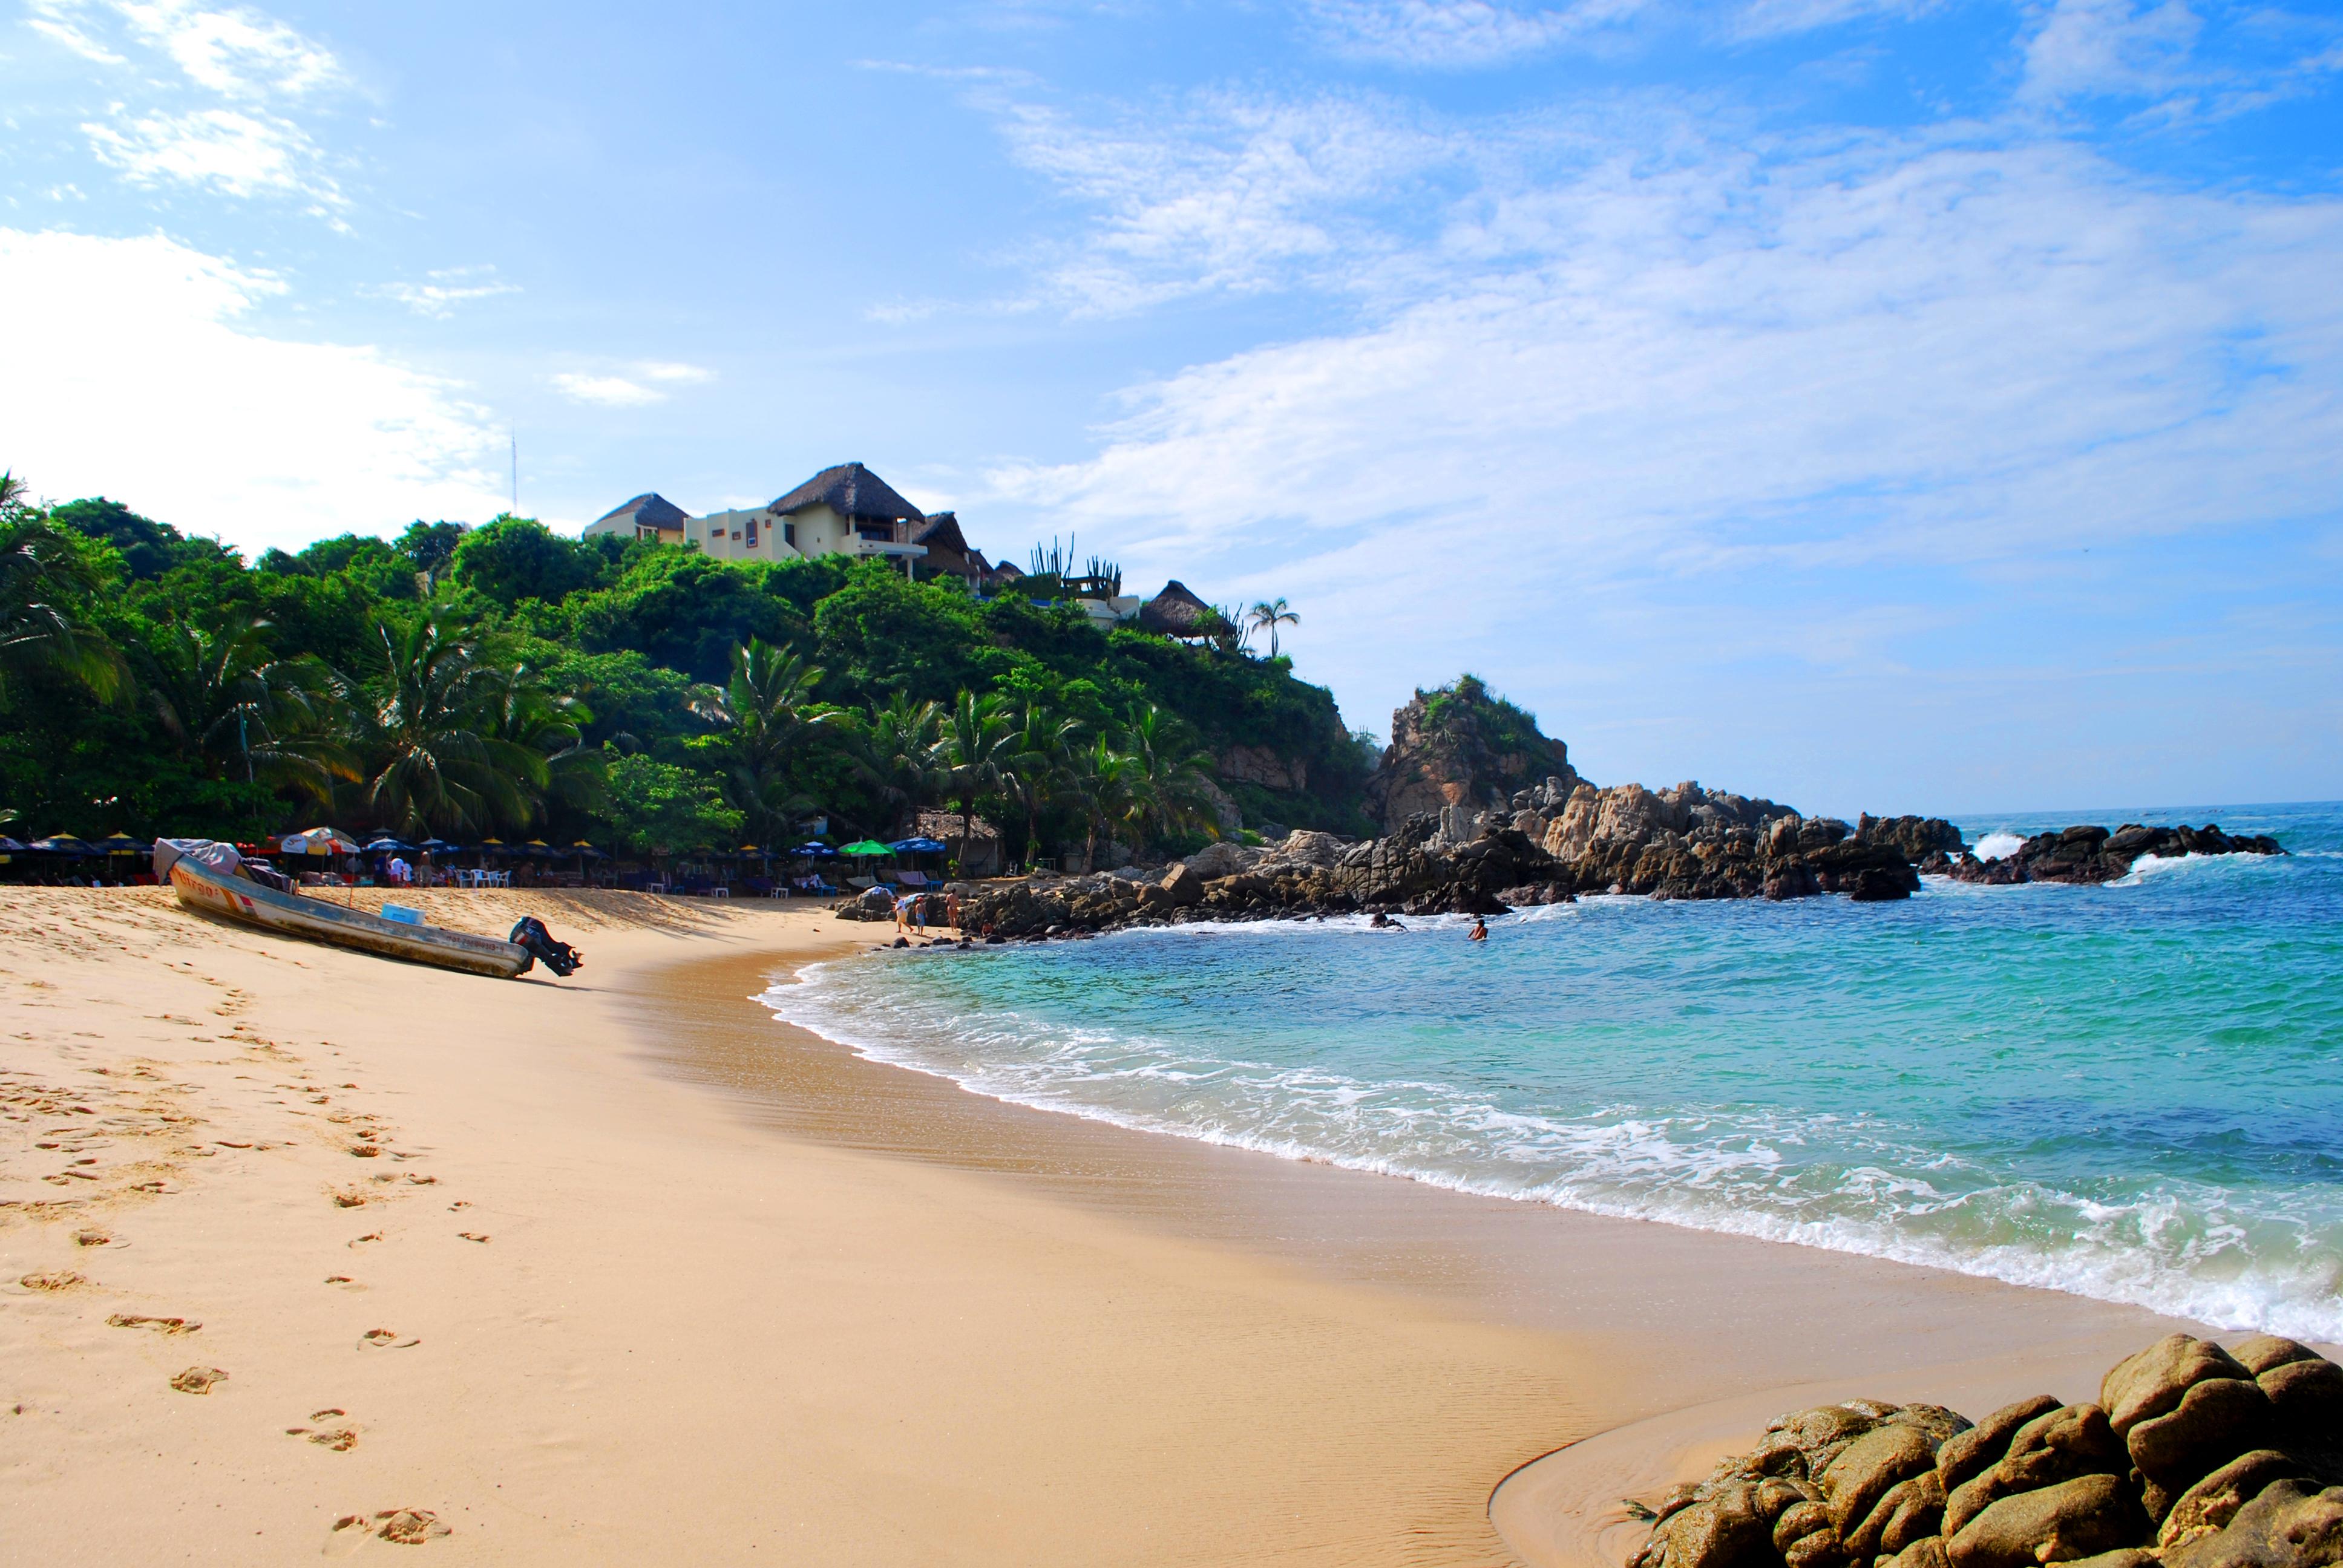 Cuba Air Bnb File Playa Manzanillo Puerto Escondido 2 Jpg Wikimedia